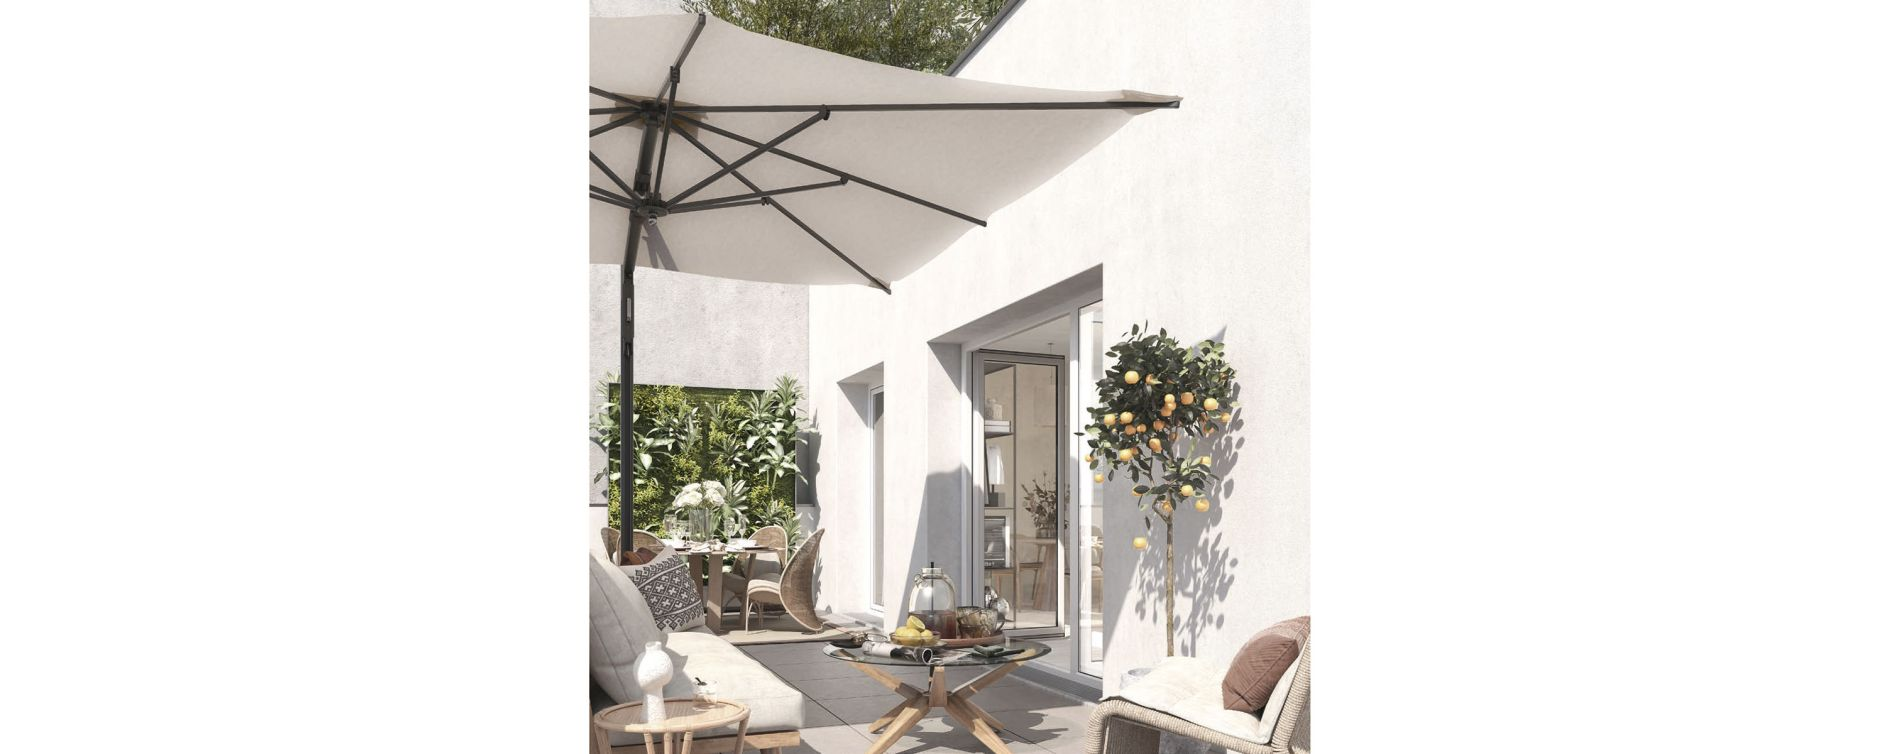 Clichy : programme immobilier neuve « Rose Guérin » (3)